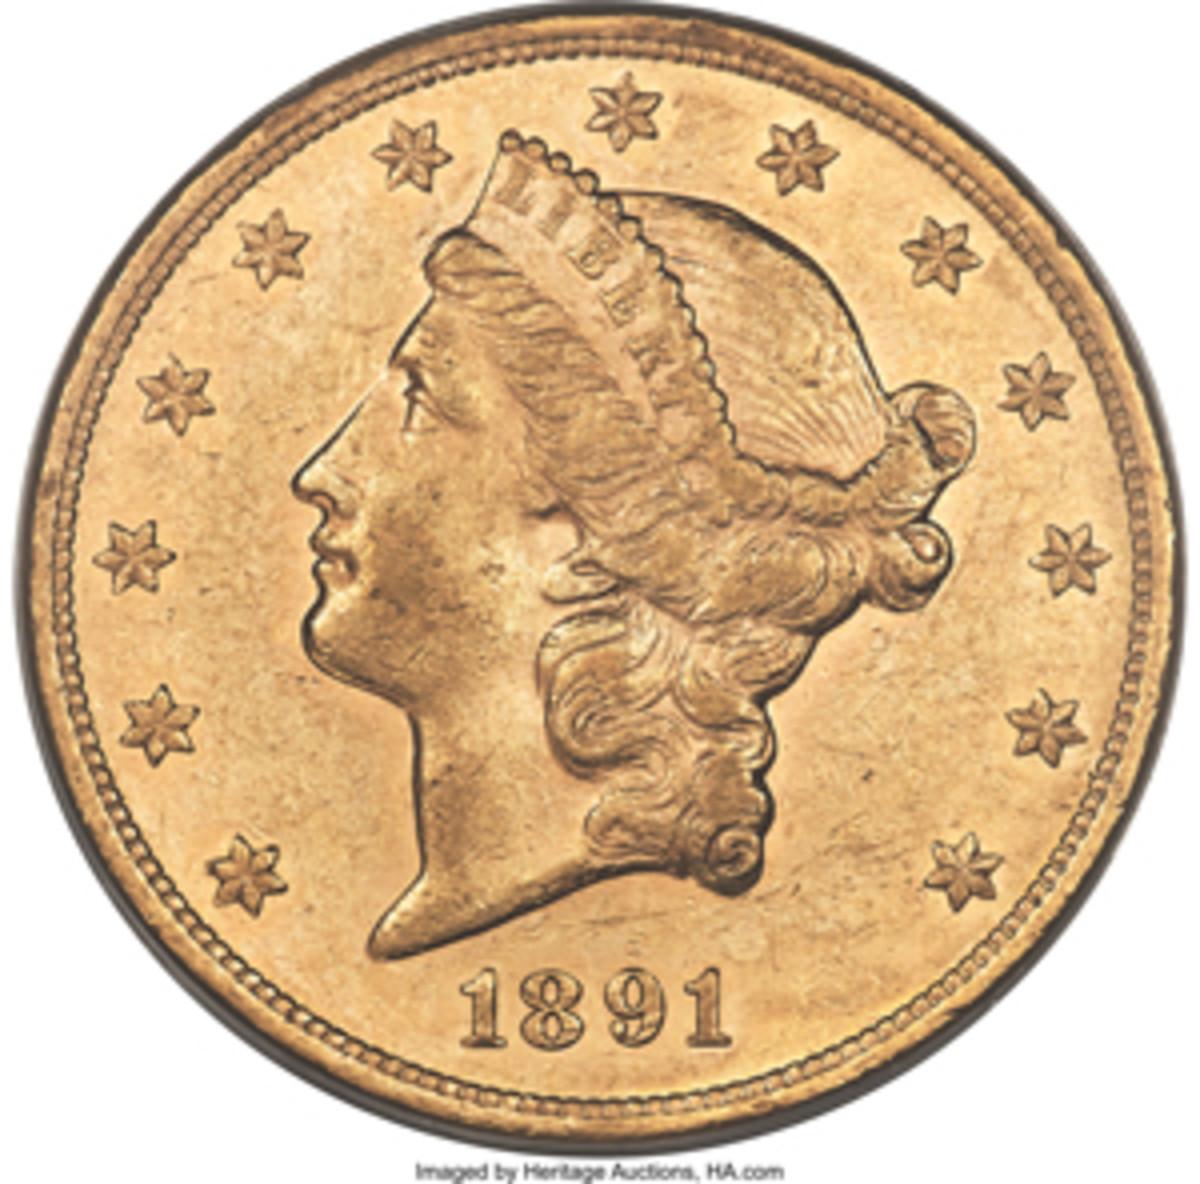 1891 Half Eagle